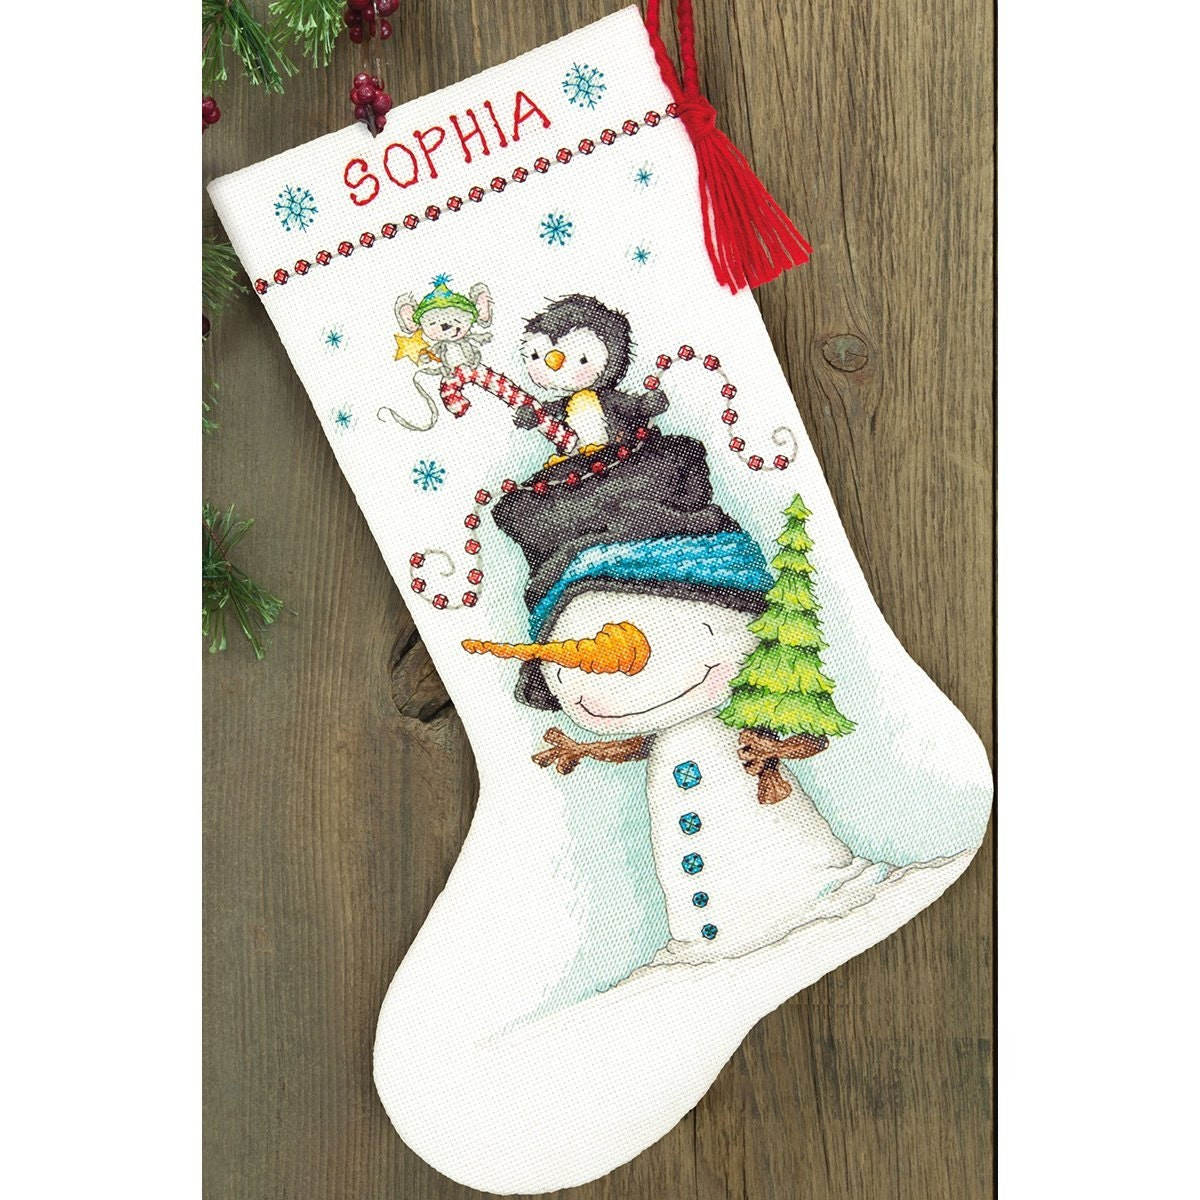 Christmas Stocking Dimensions